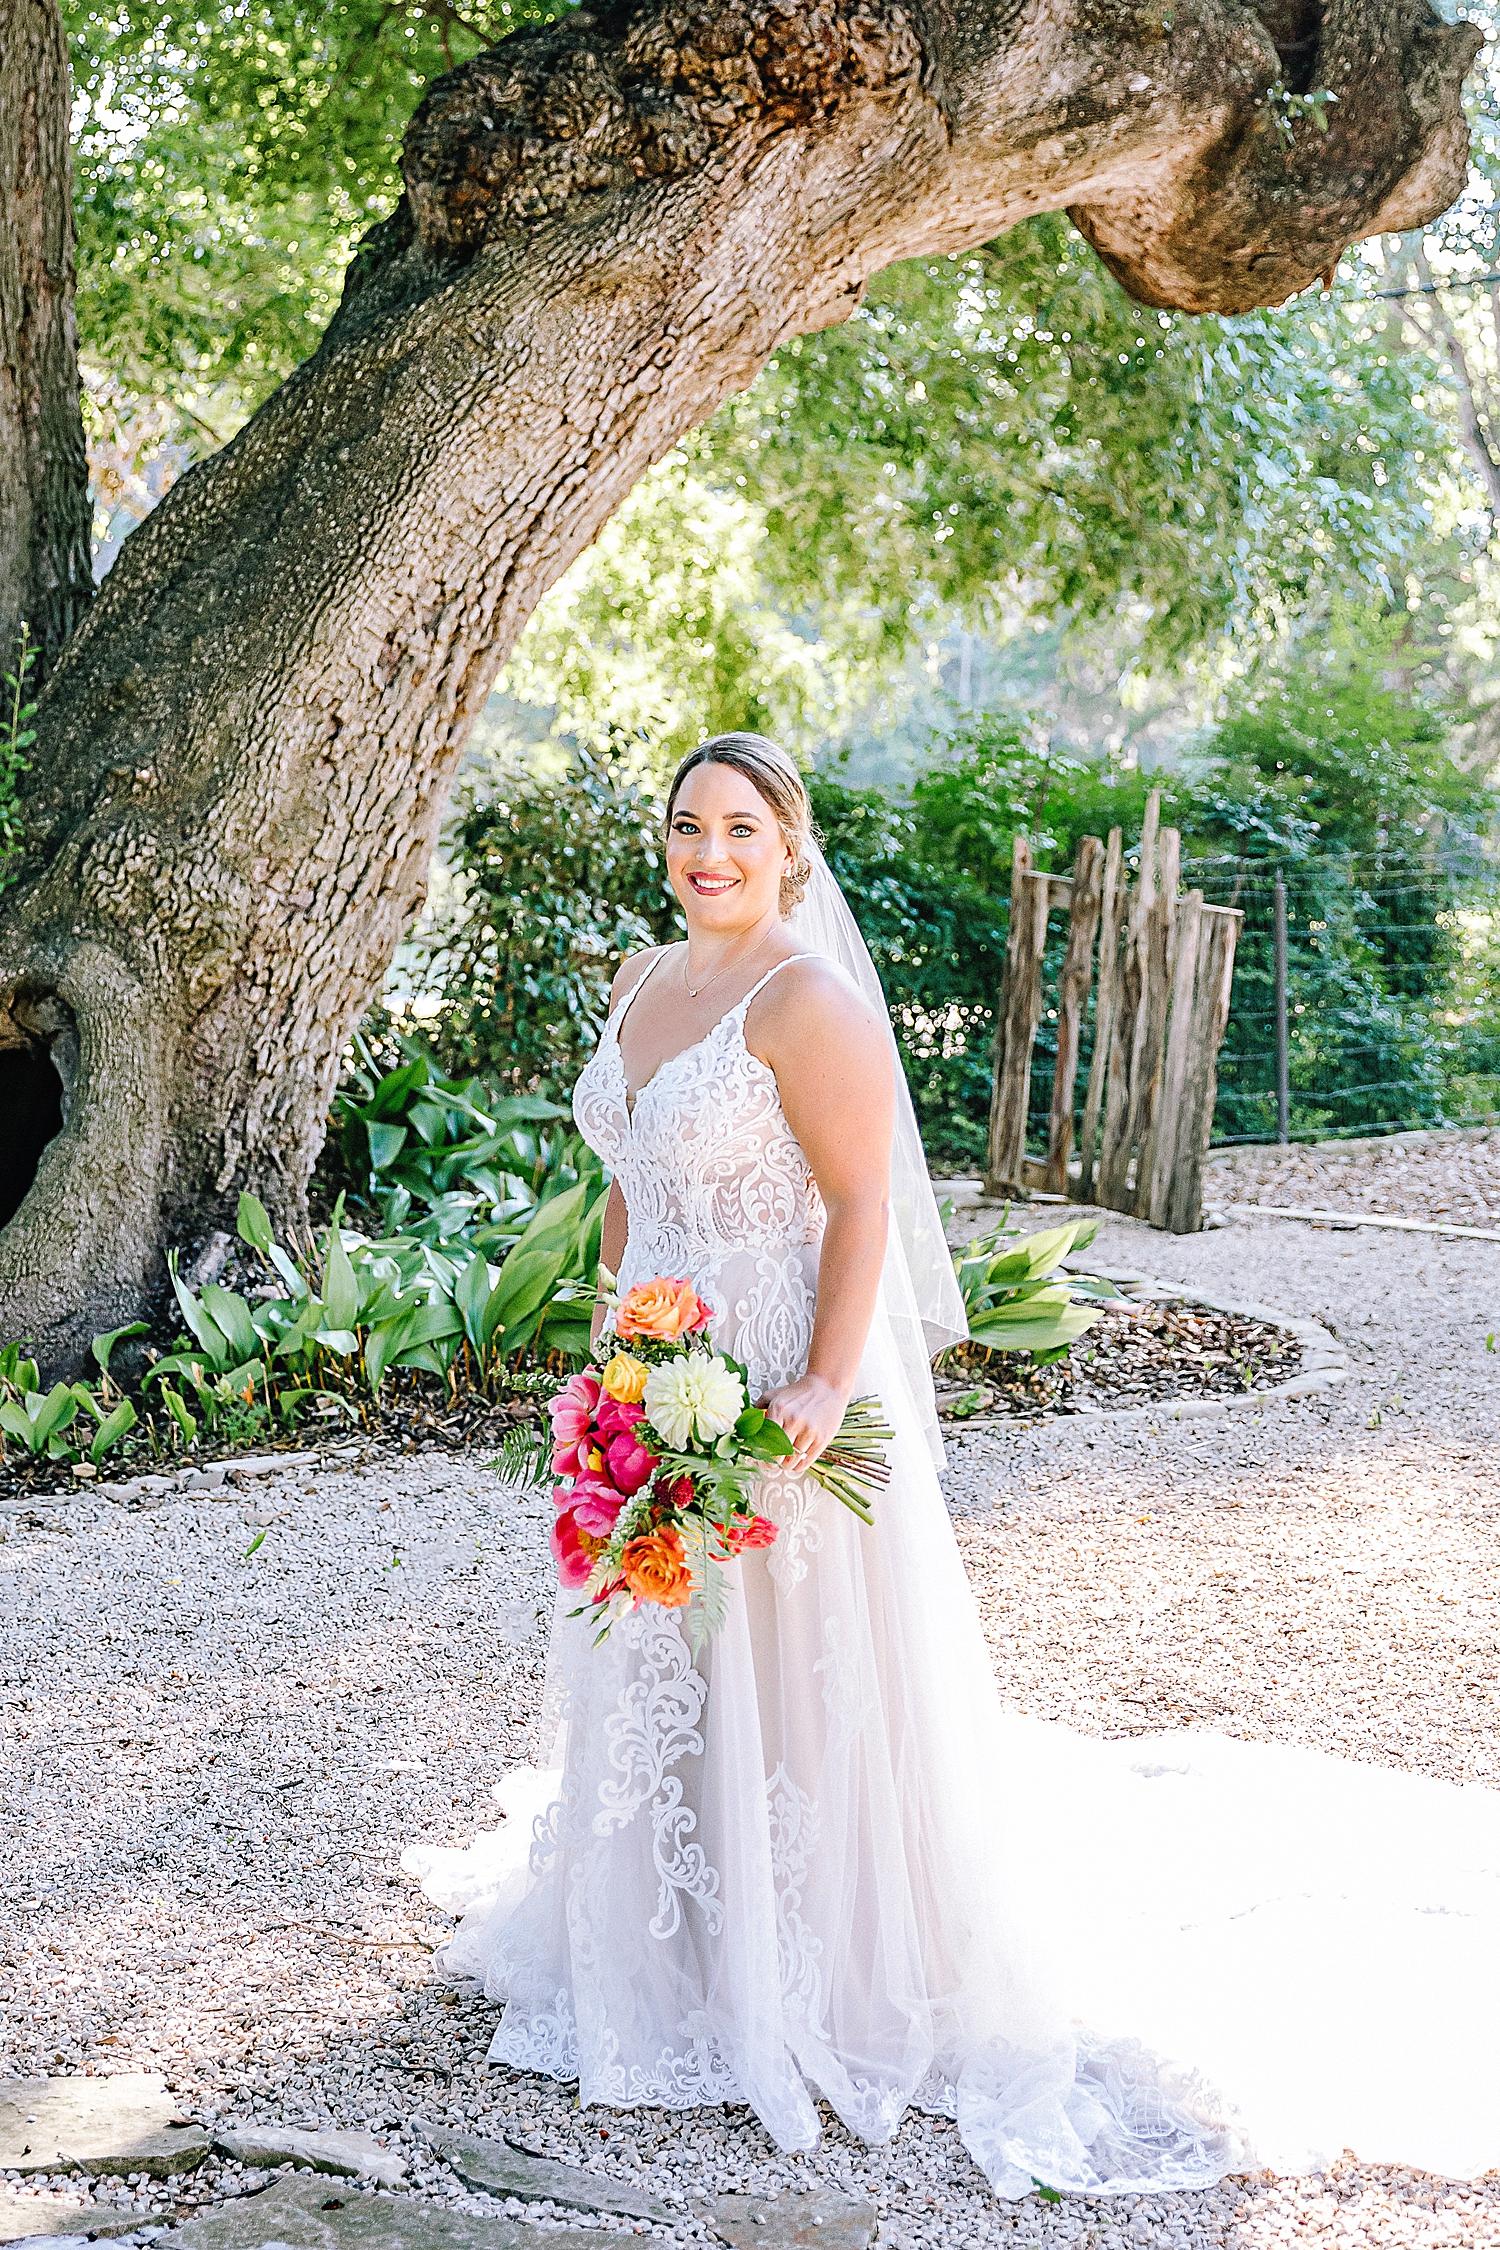 Gruene-Estate-Wedding-New-Braunfels-Bride-Bridal-Photos-Carly-Barton-Photography_0001.jpg